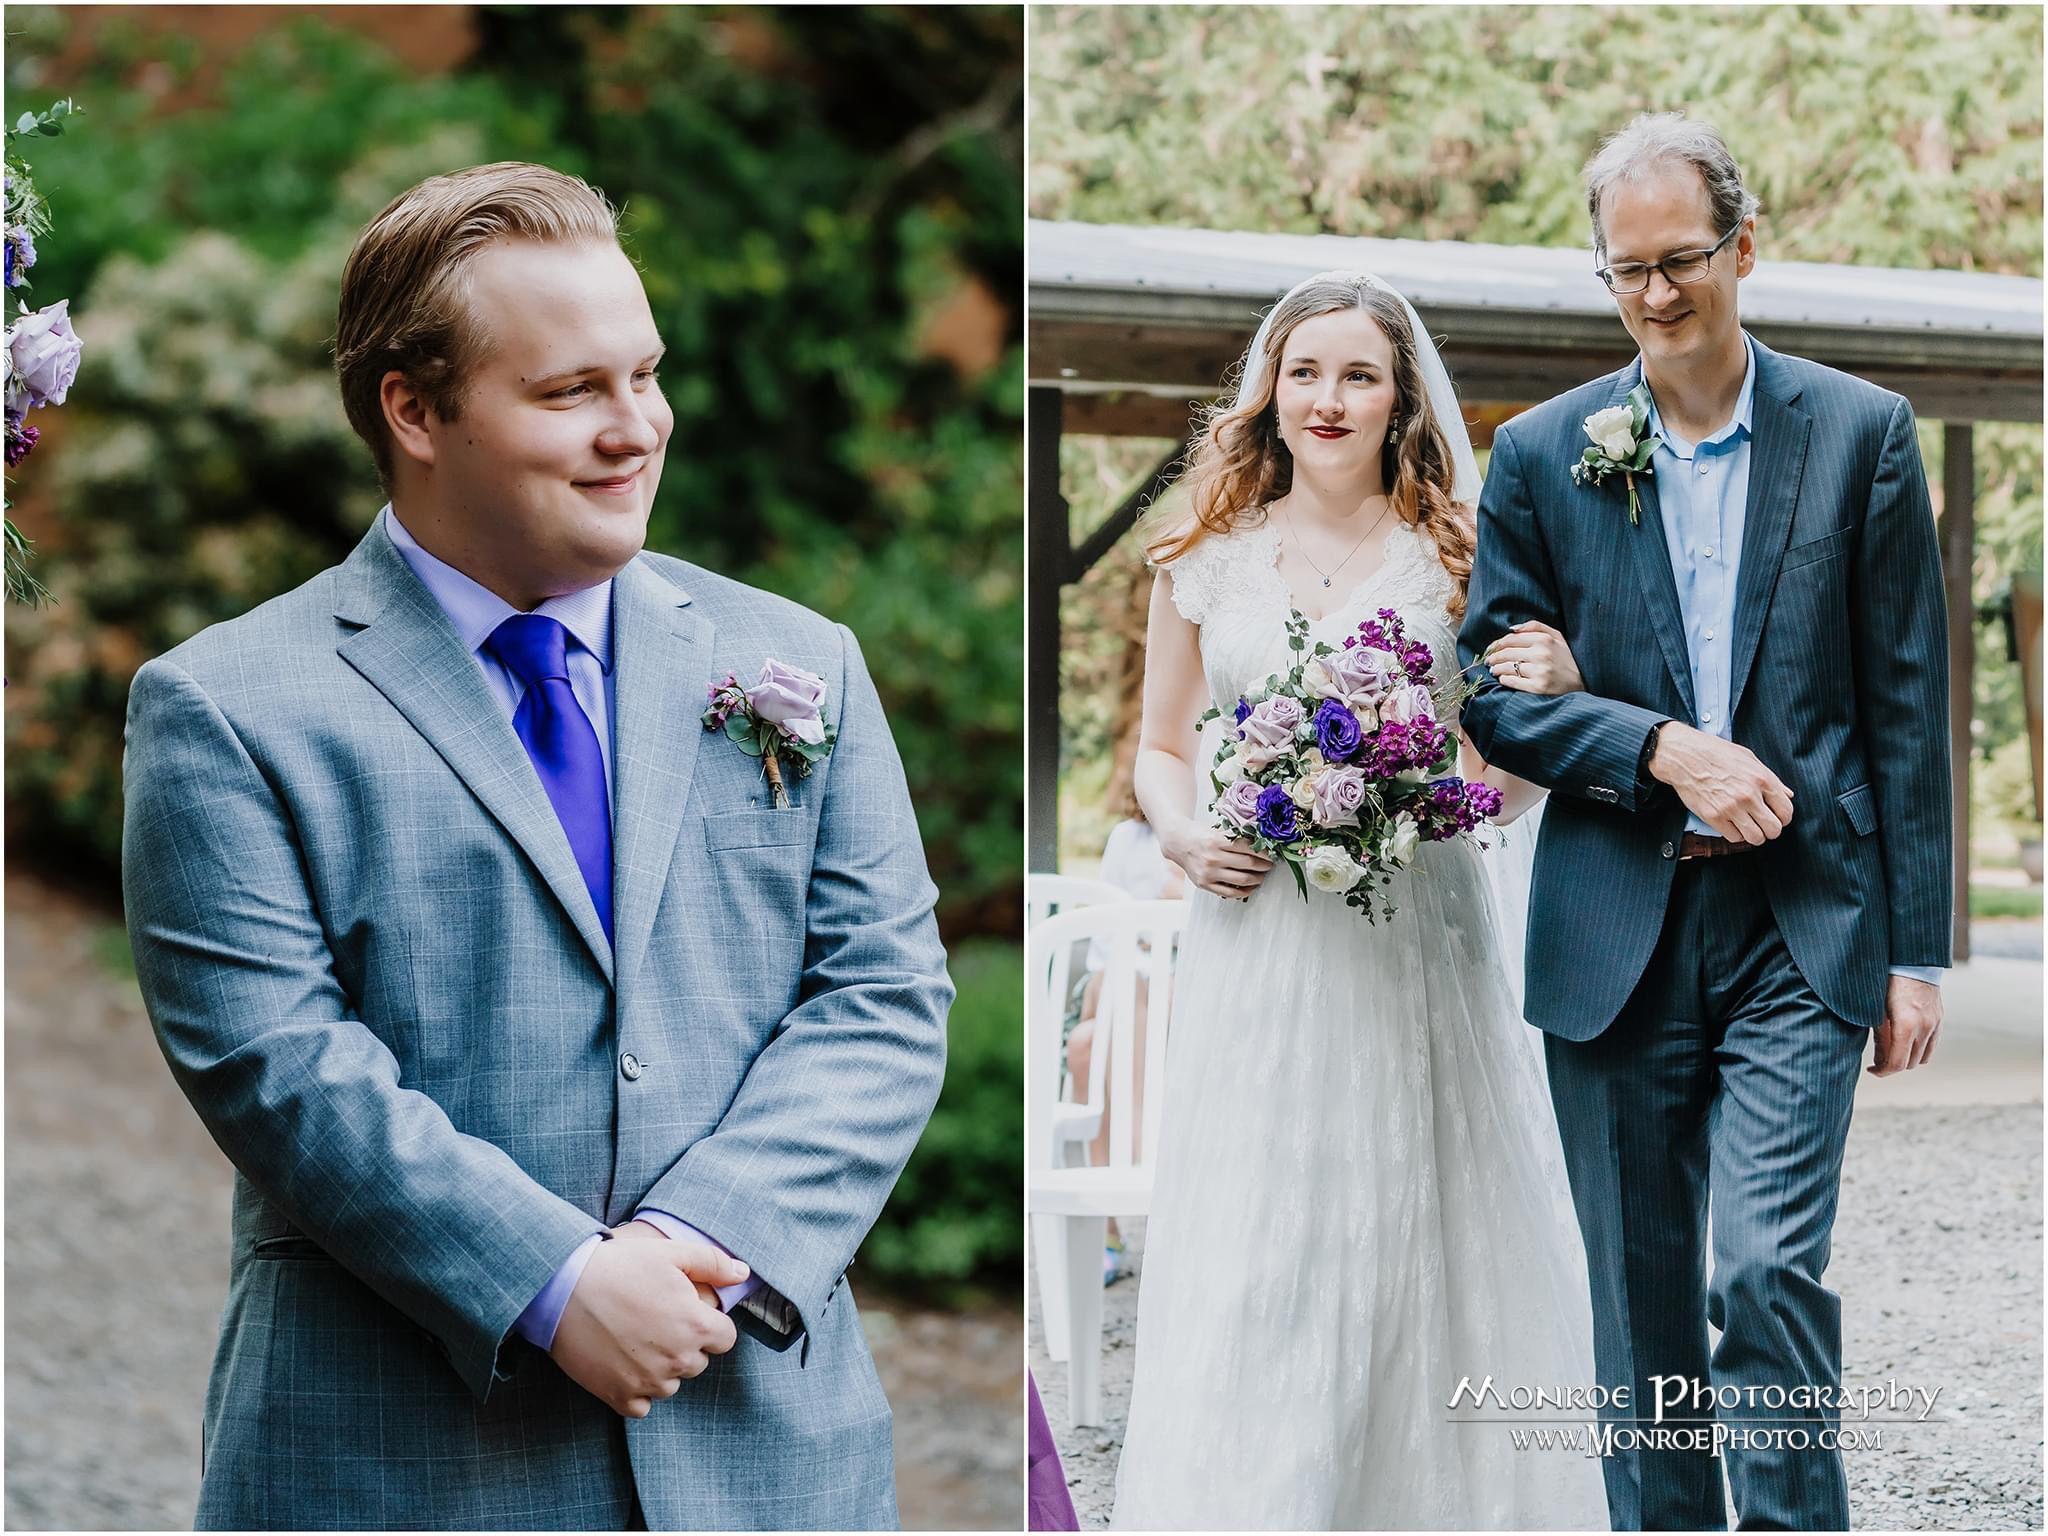 @traveloregon   #wedding #pnwphotographer #firstlook #weddingdress #weddingphotography #weddinghairstyles